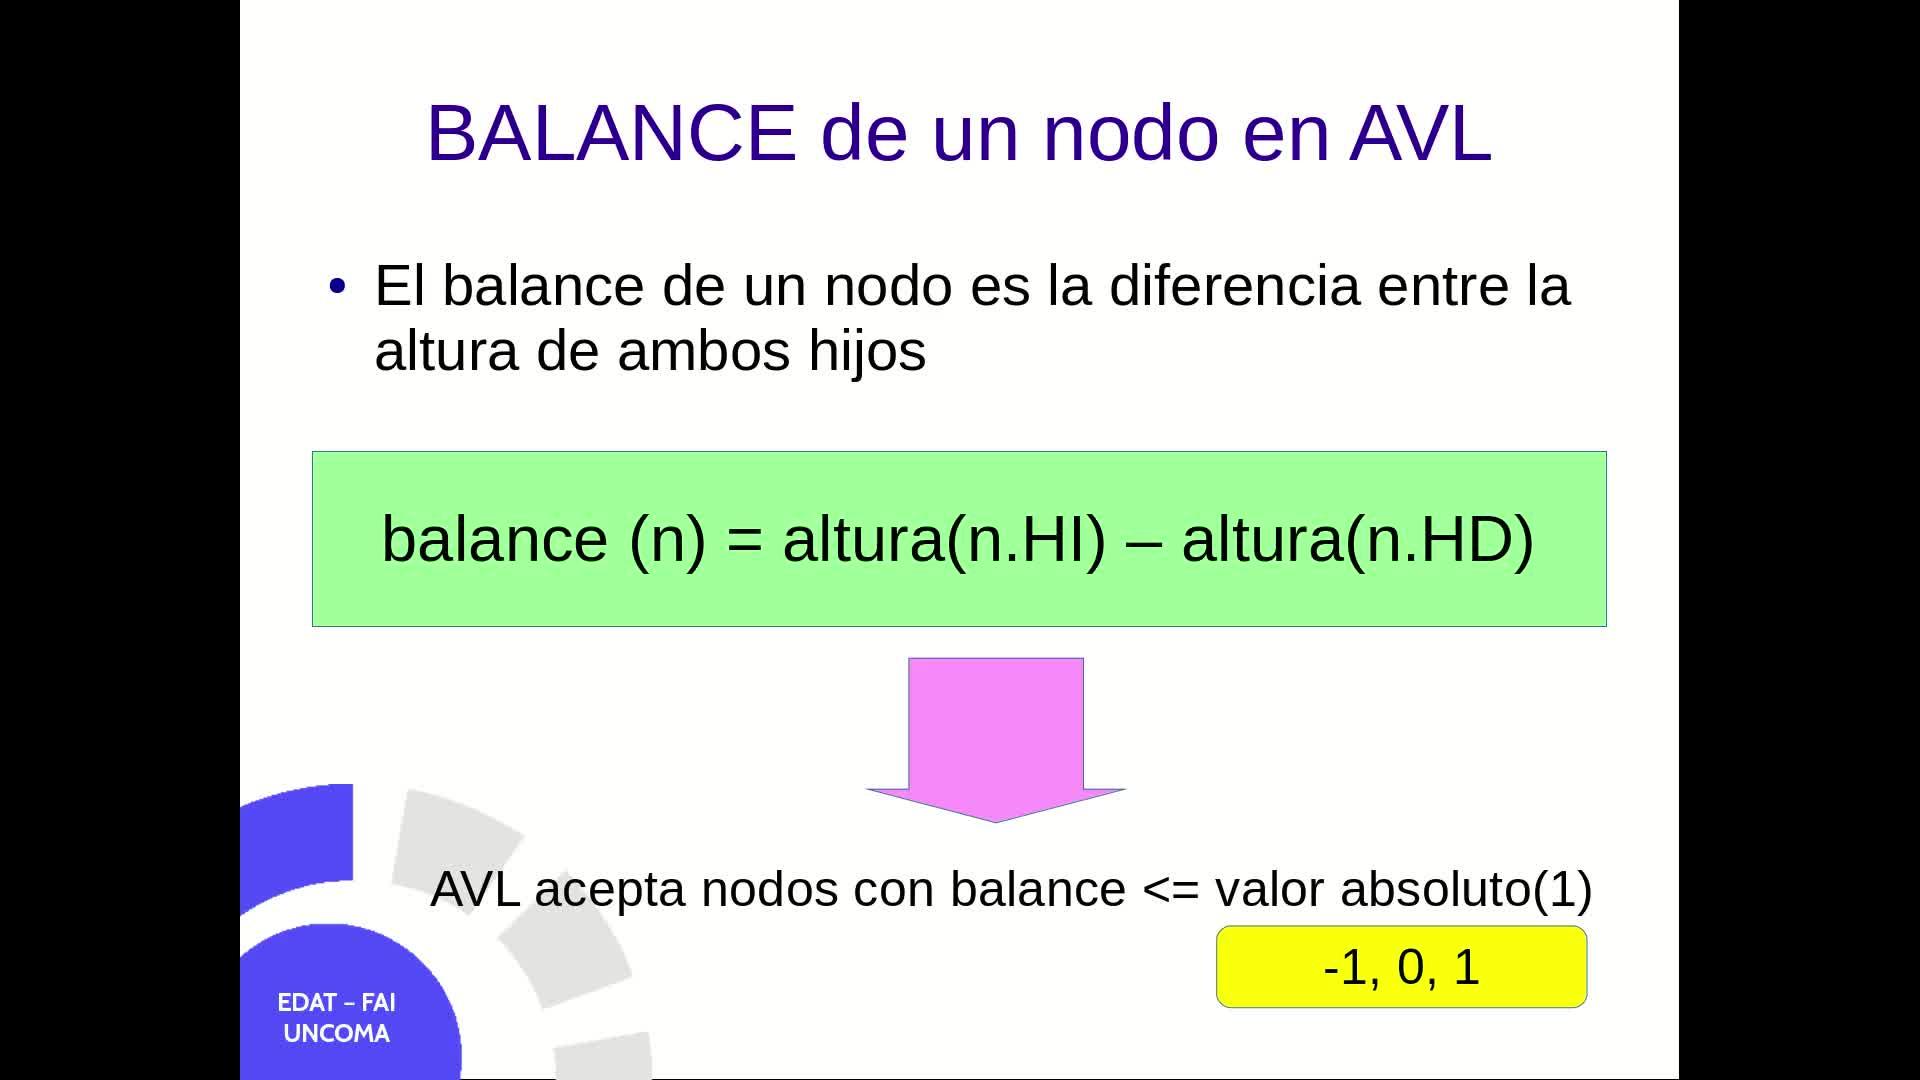 EDAT - Video 4.5 - TDA árboles AVL